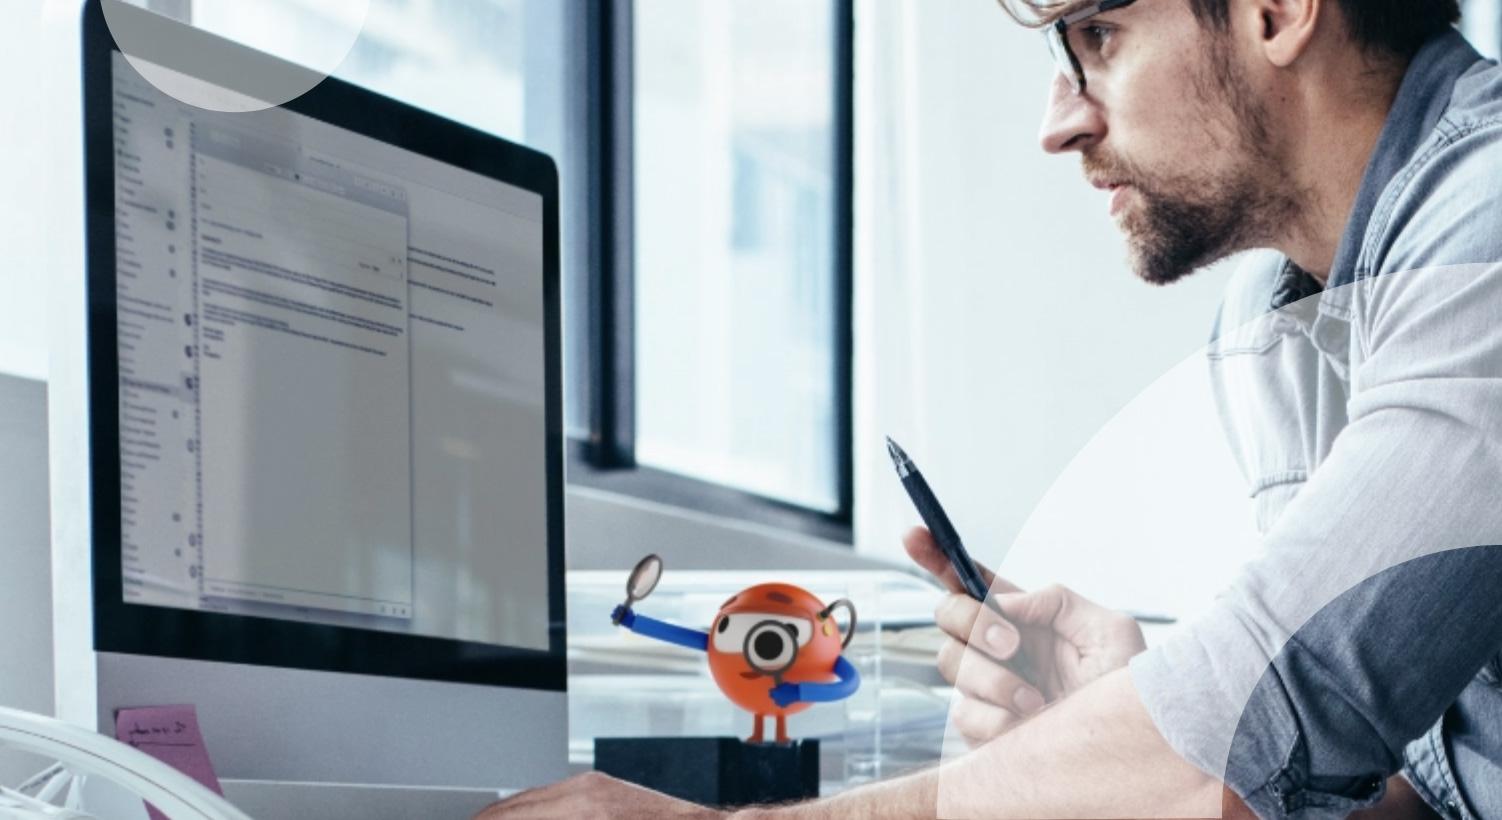 Finance – Flip the script on tedious tasks